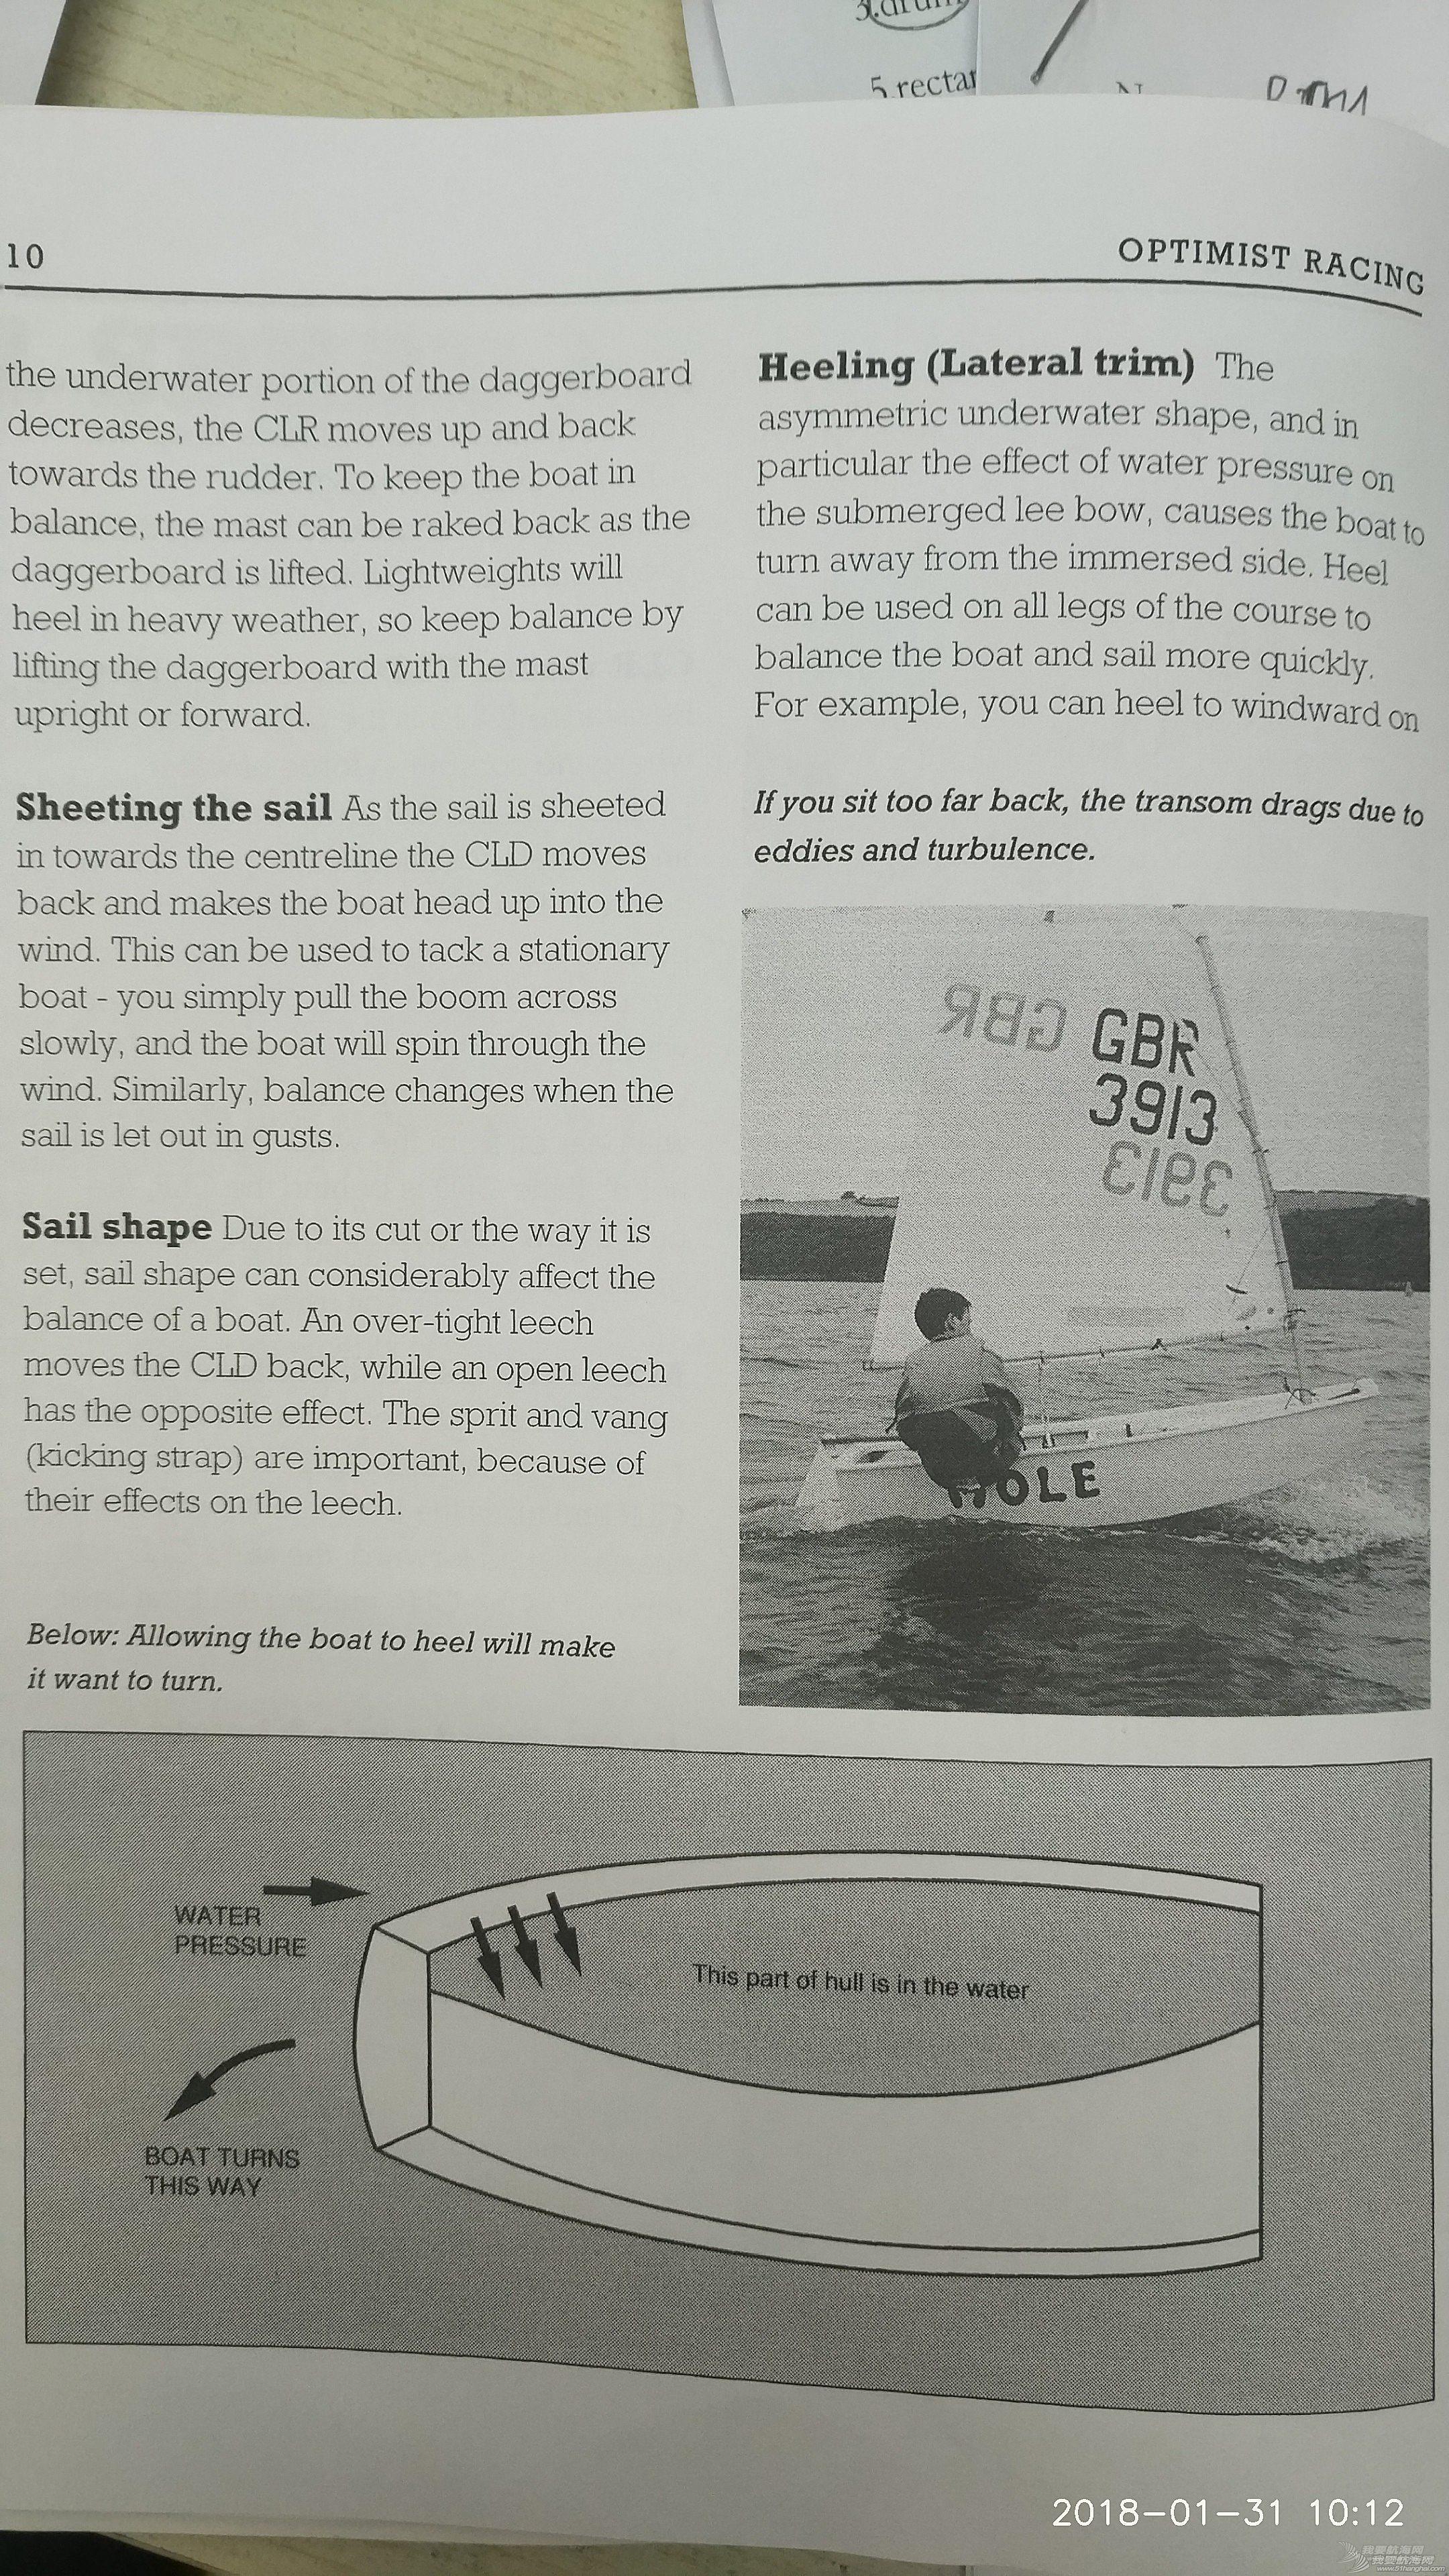 op帆船,稳向板,帆形,阻力中心,动力中心 《乐观级帆船竞赛手册》---第一部分---速度(续)